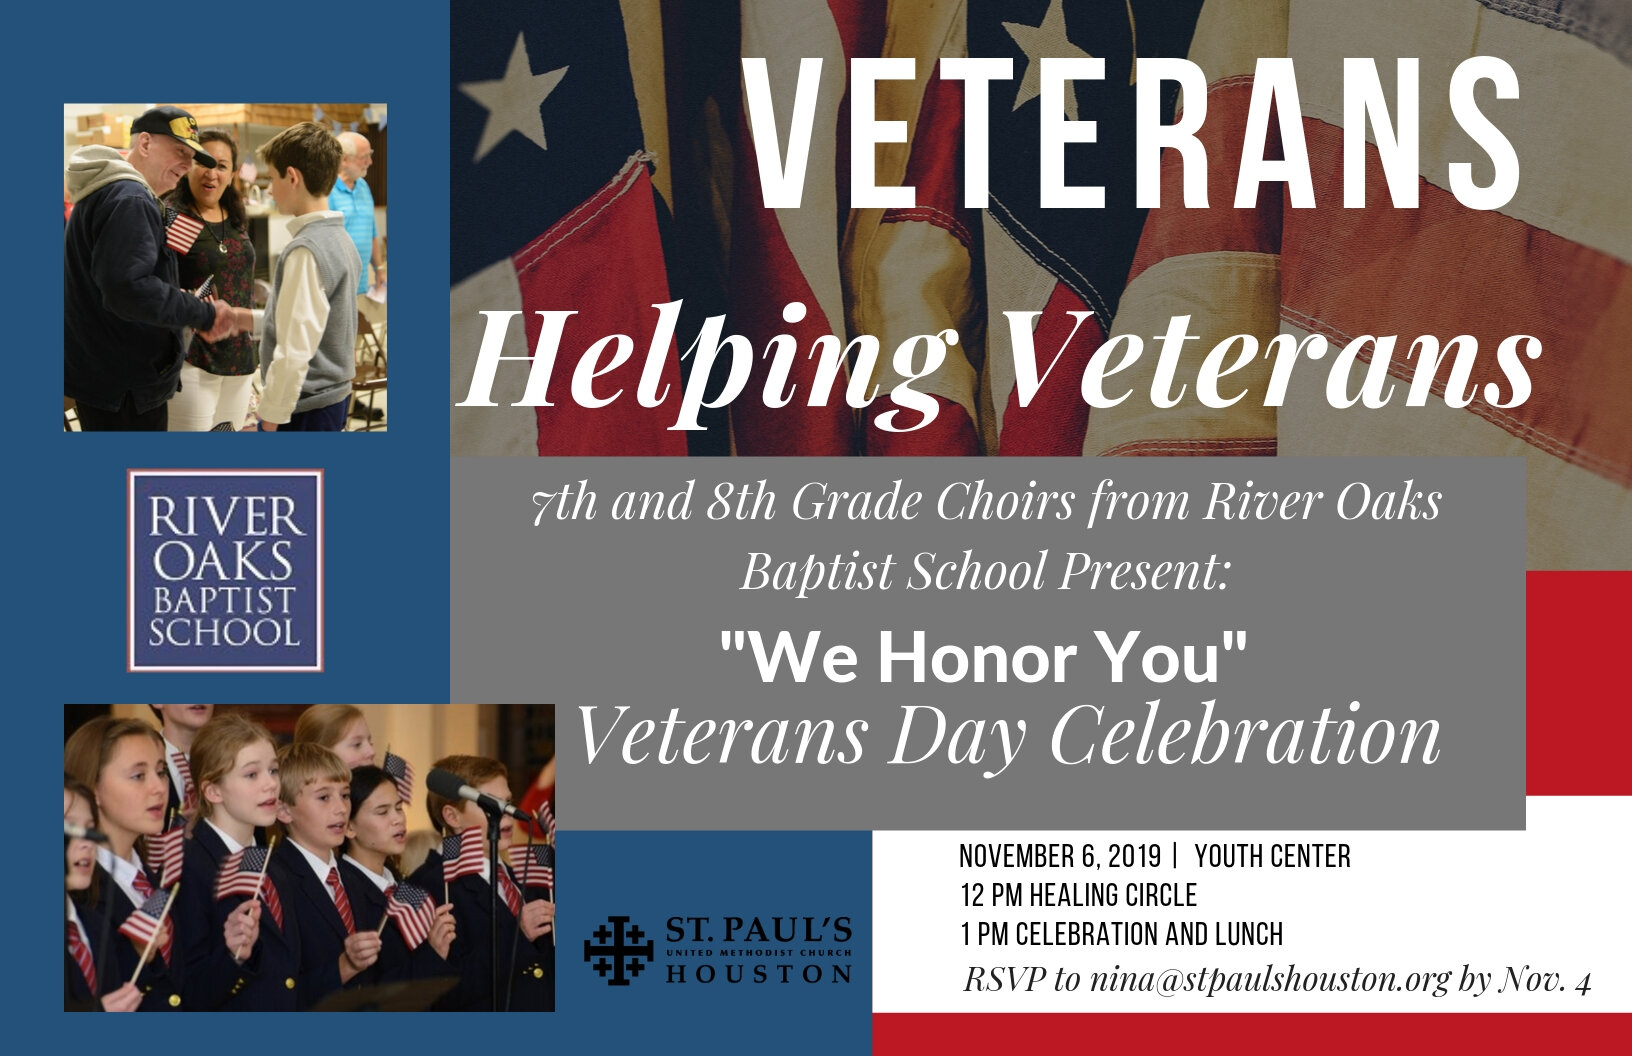 Veterans Day Celebration with ROBS-1.jpg